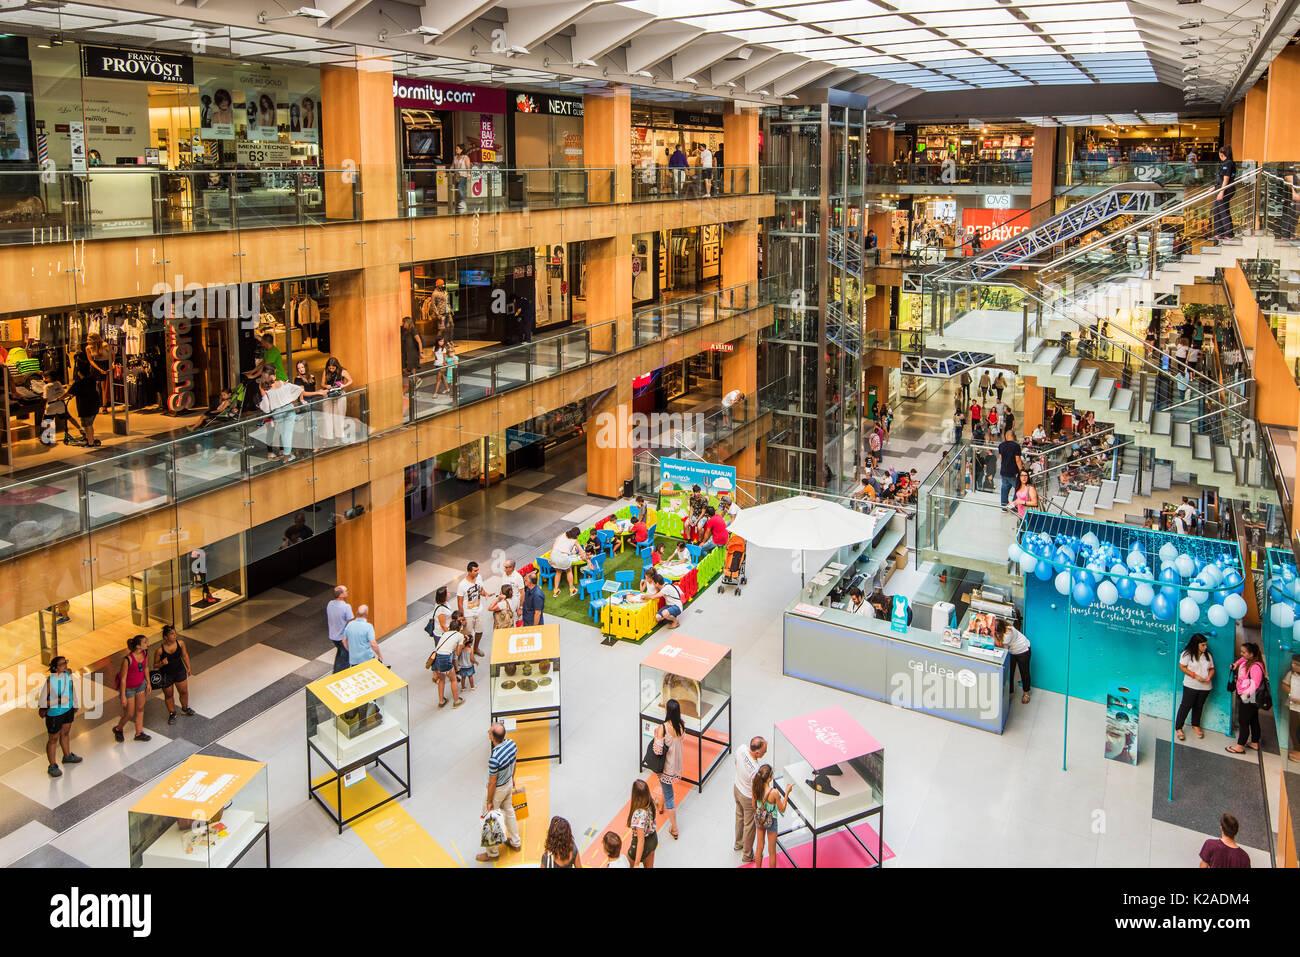 Illa Carlemany shopping mall, Andorra La Vella, Andorra - Stock Image